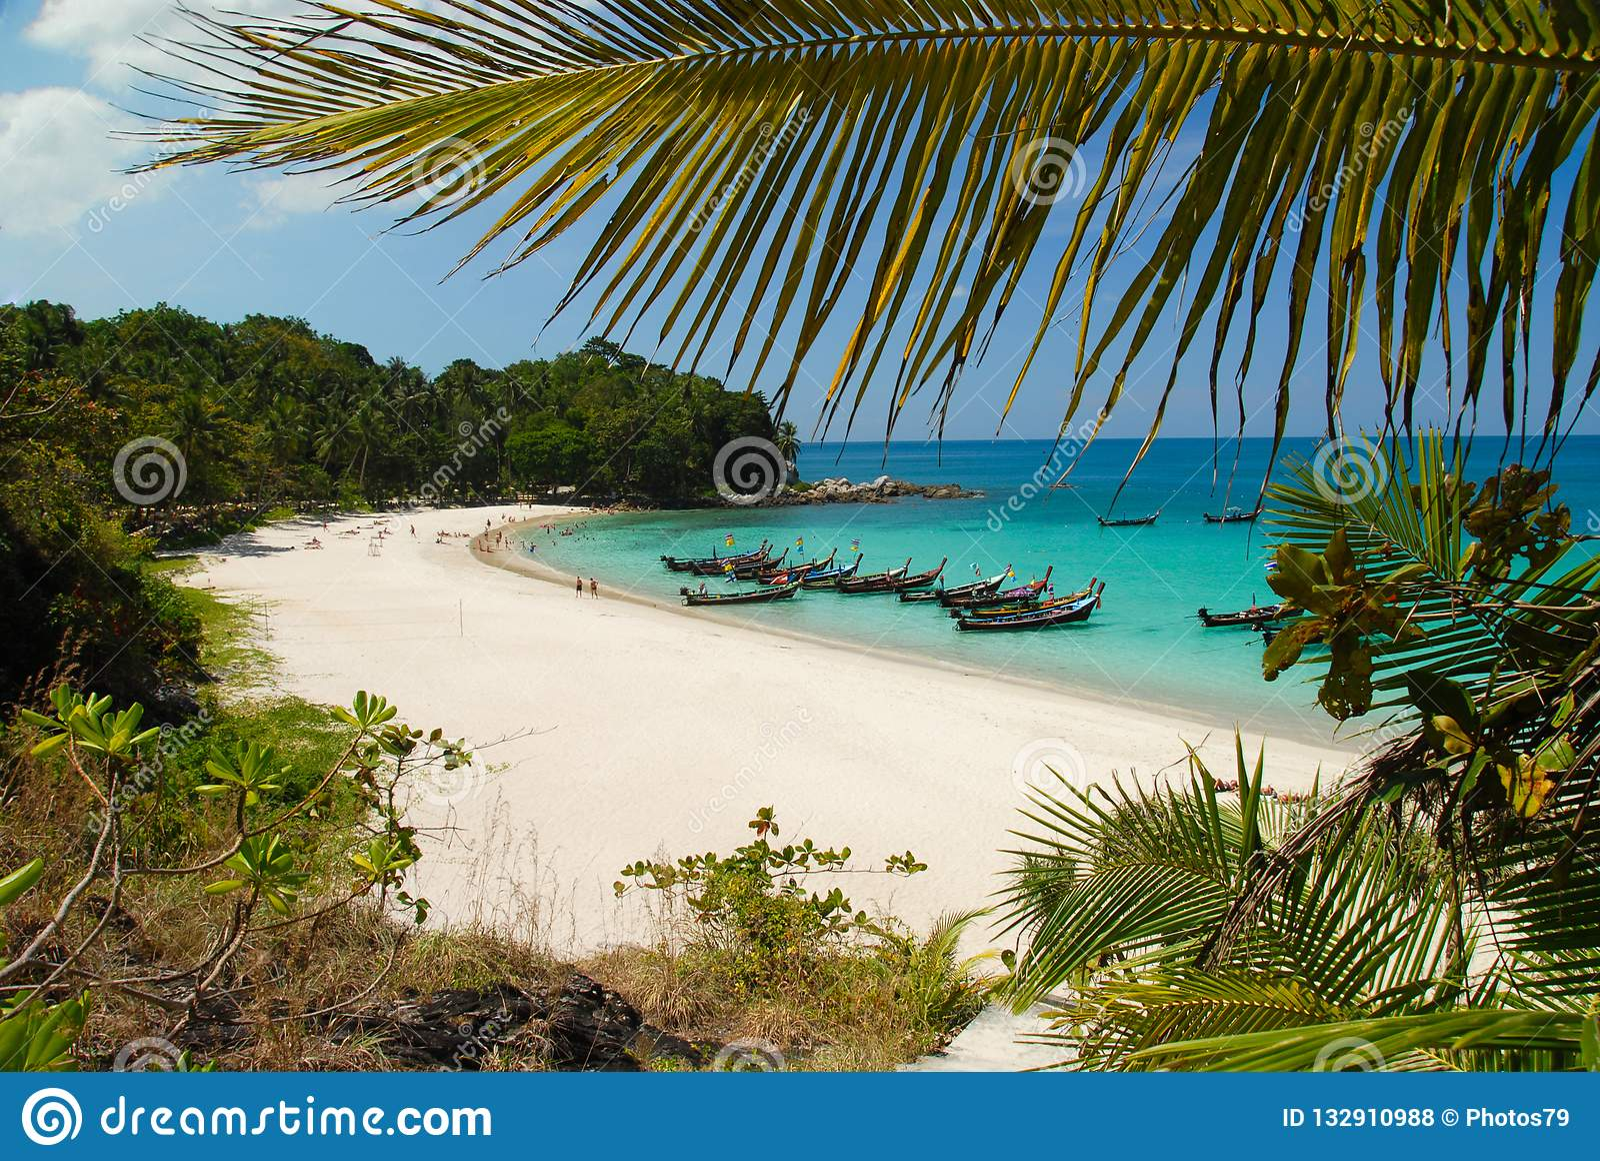 Freedom Beach In Phuket Thailand Stock Photo Image Of